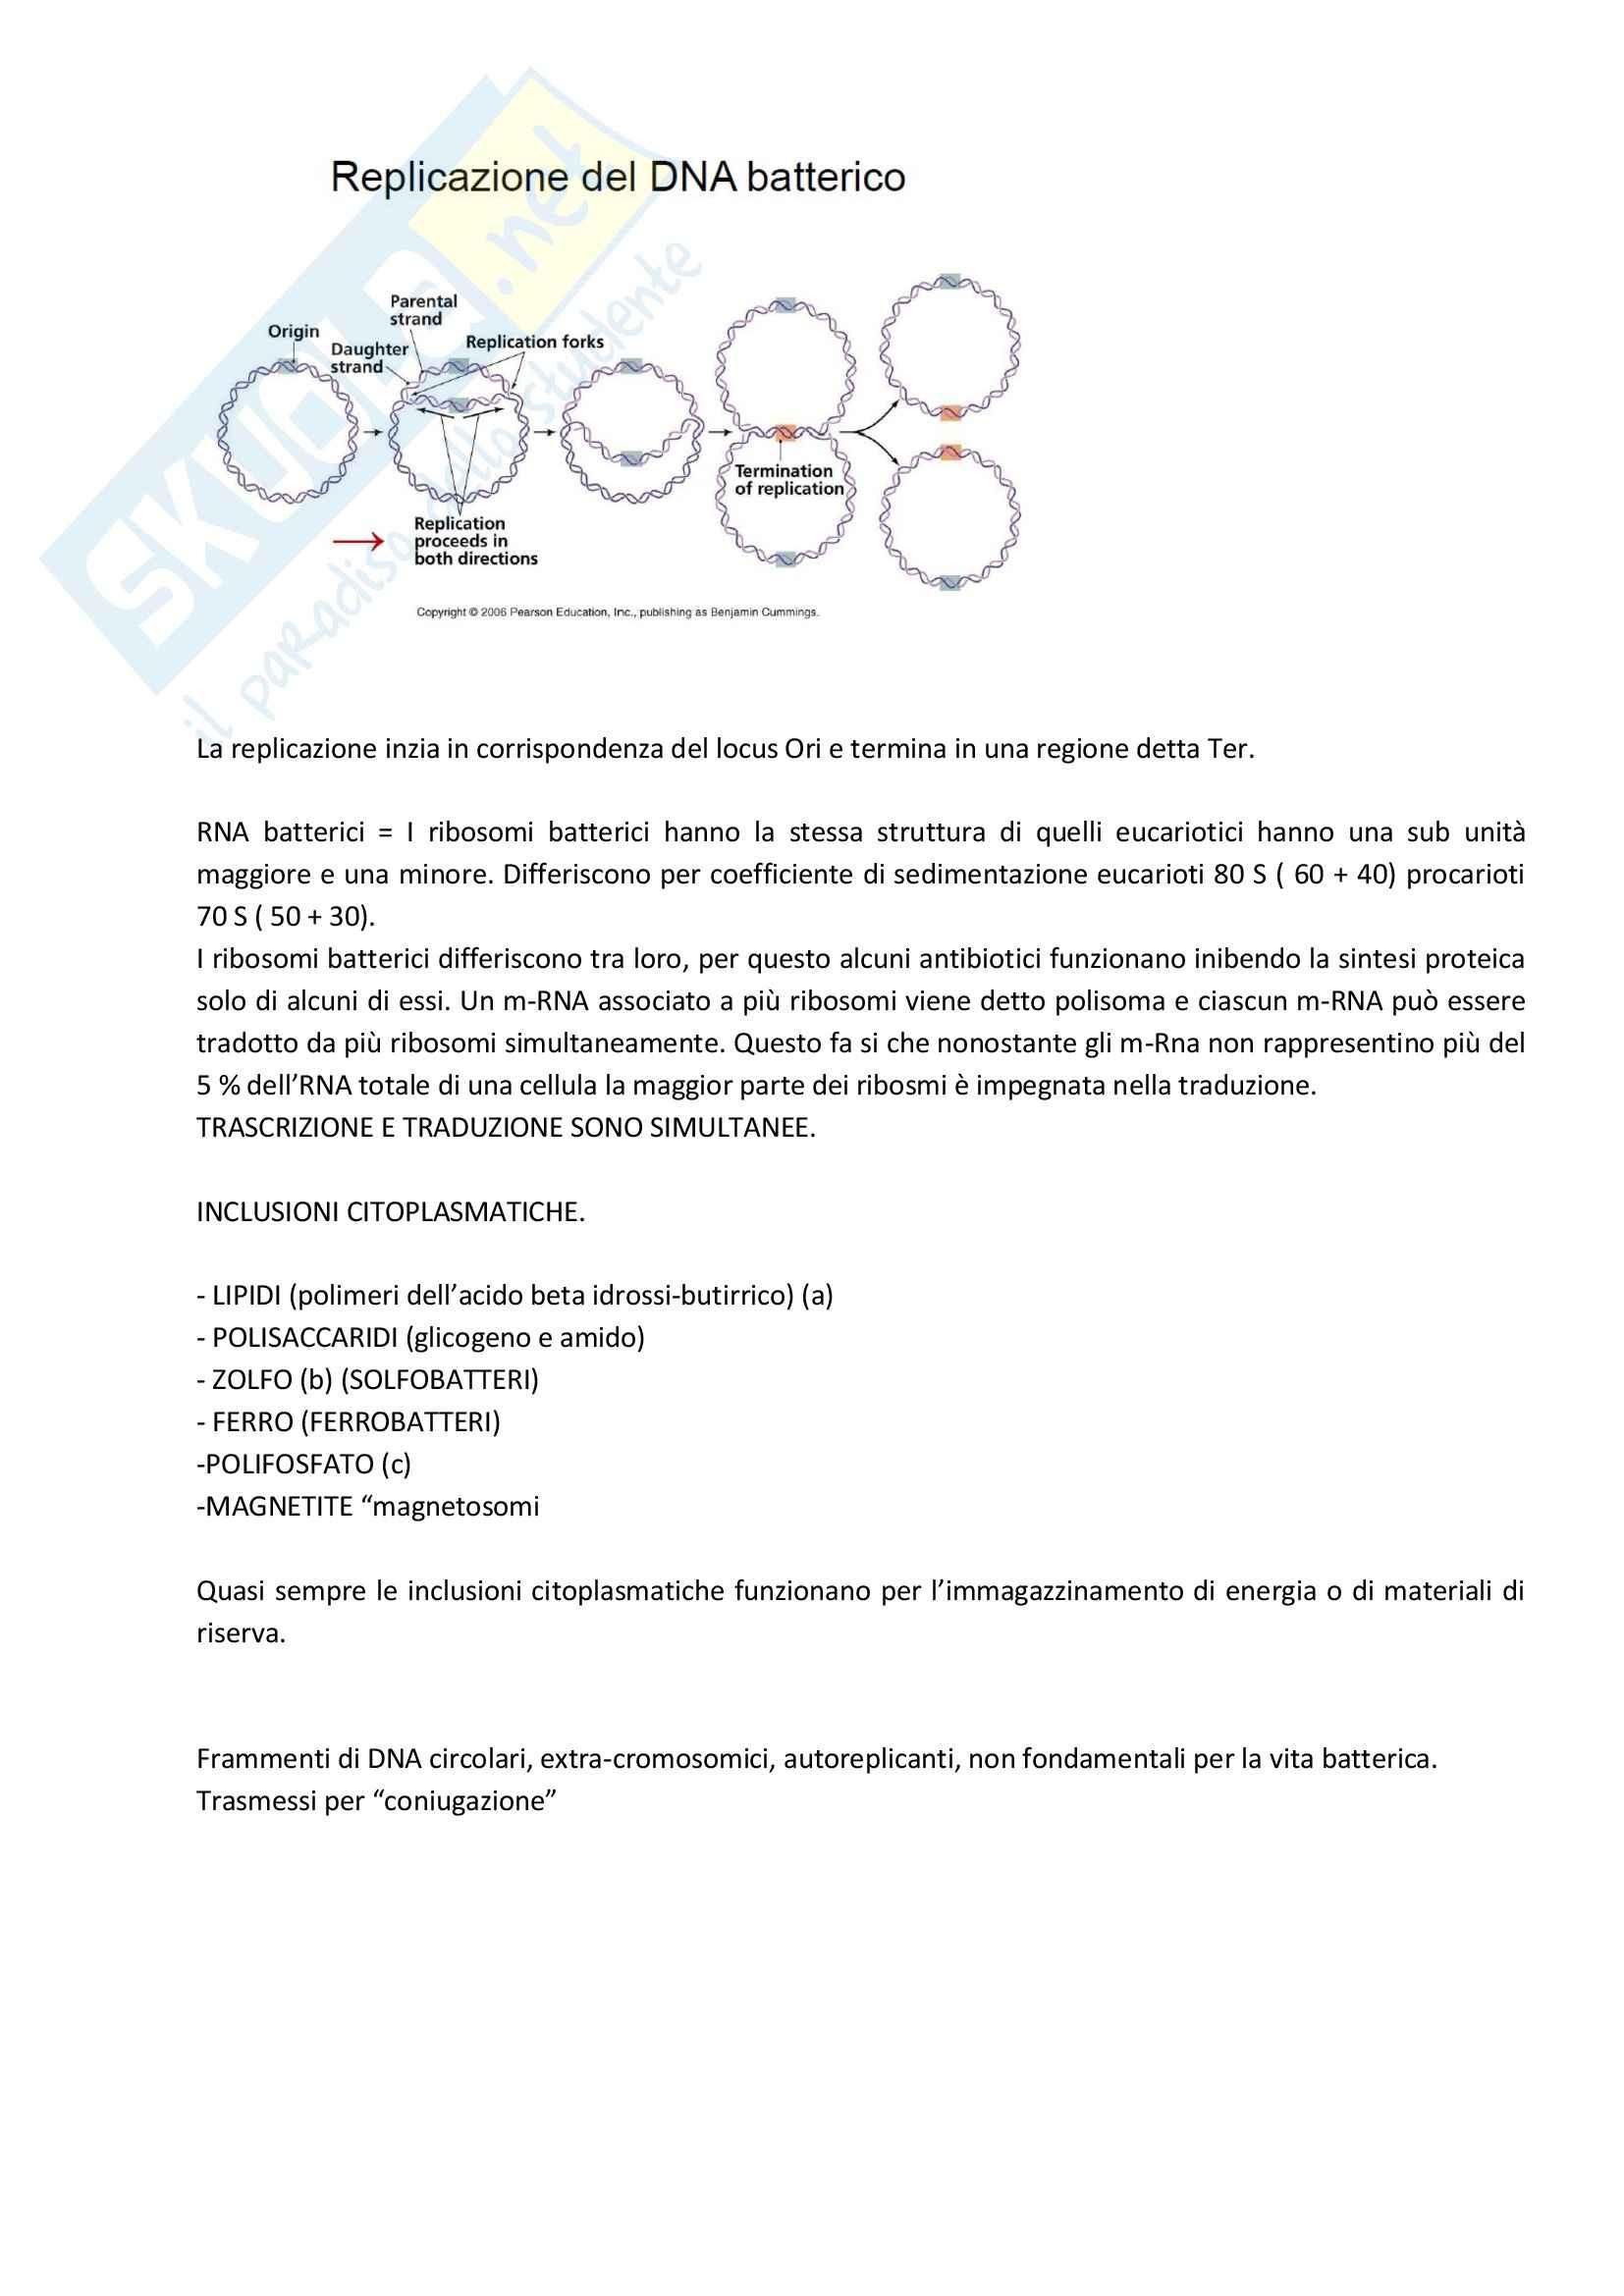 Microbiologia - Appunti Pag. 6